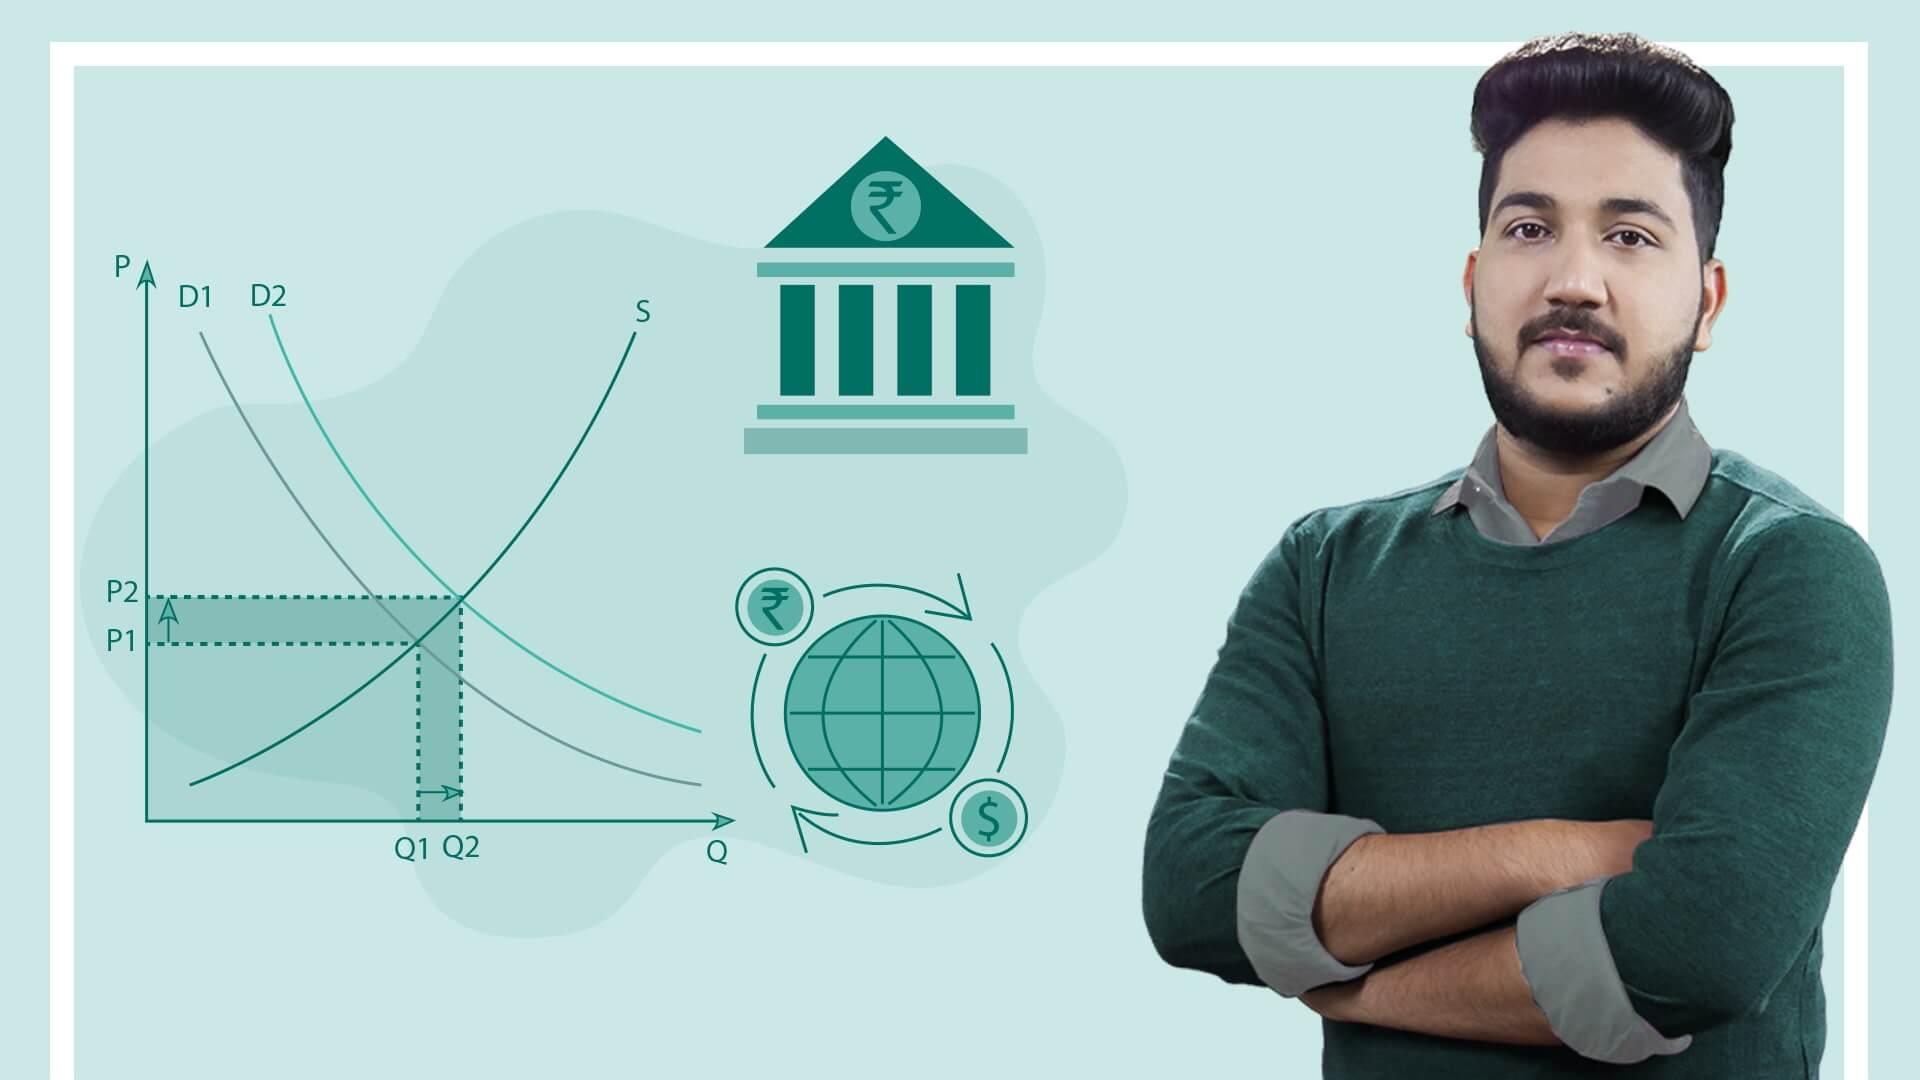 CBSE Class XII Introductory - Macroeconomics - 2021-22